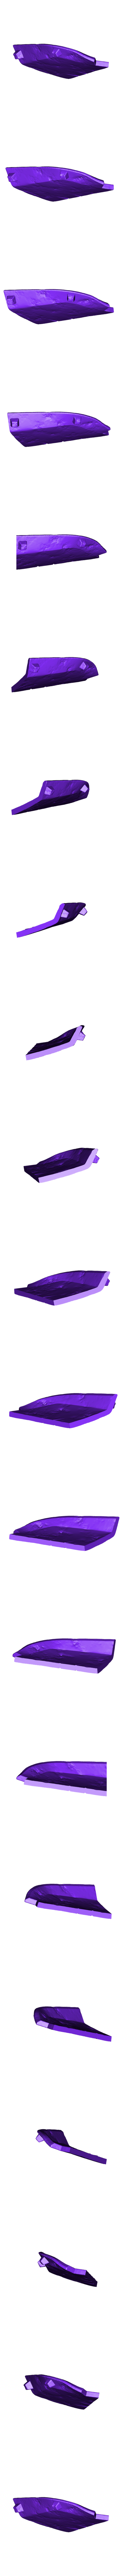 Armory_Damaged_Print18.stl Download OBJ file Armory - Knights of Ren Helmet (damaged), 3D print model • 3D print design, 3D-mon